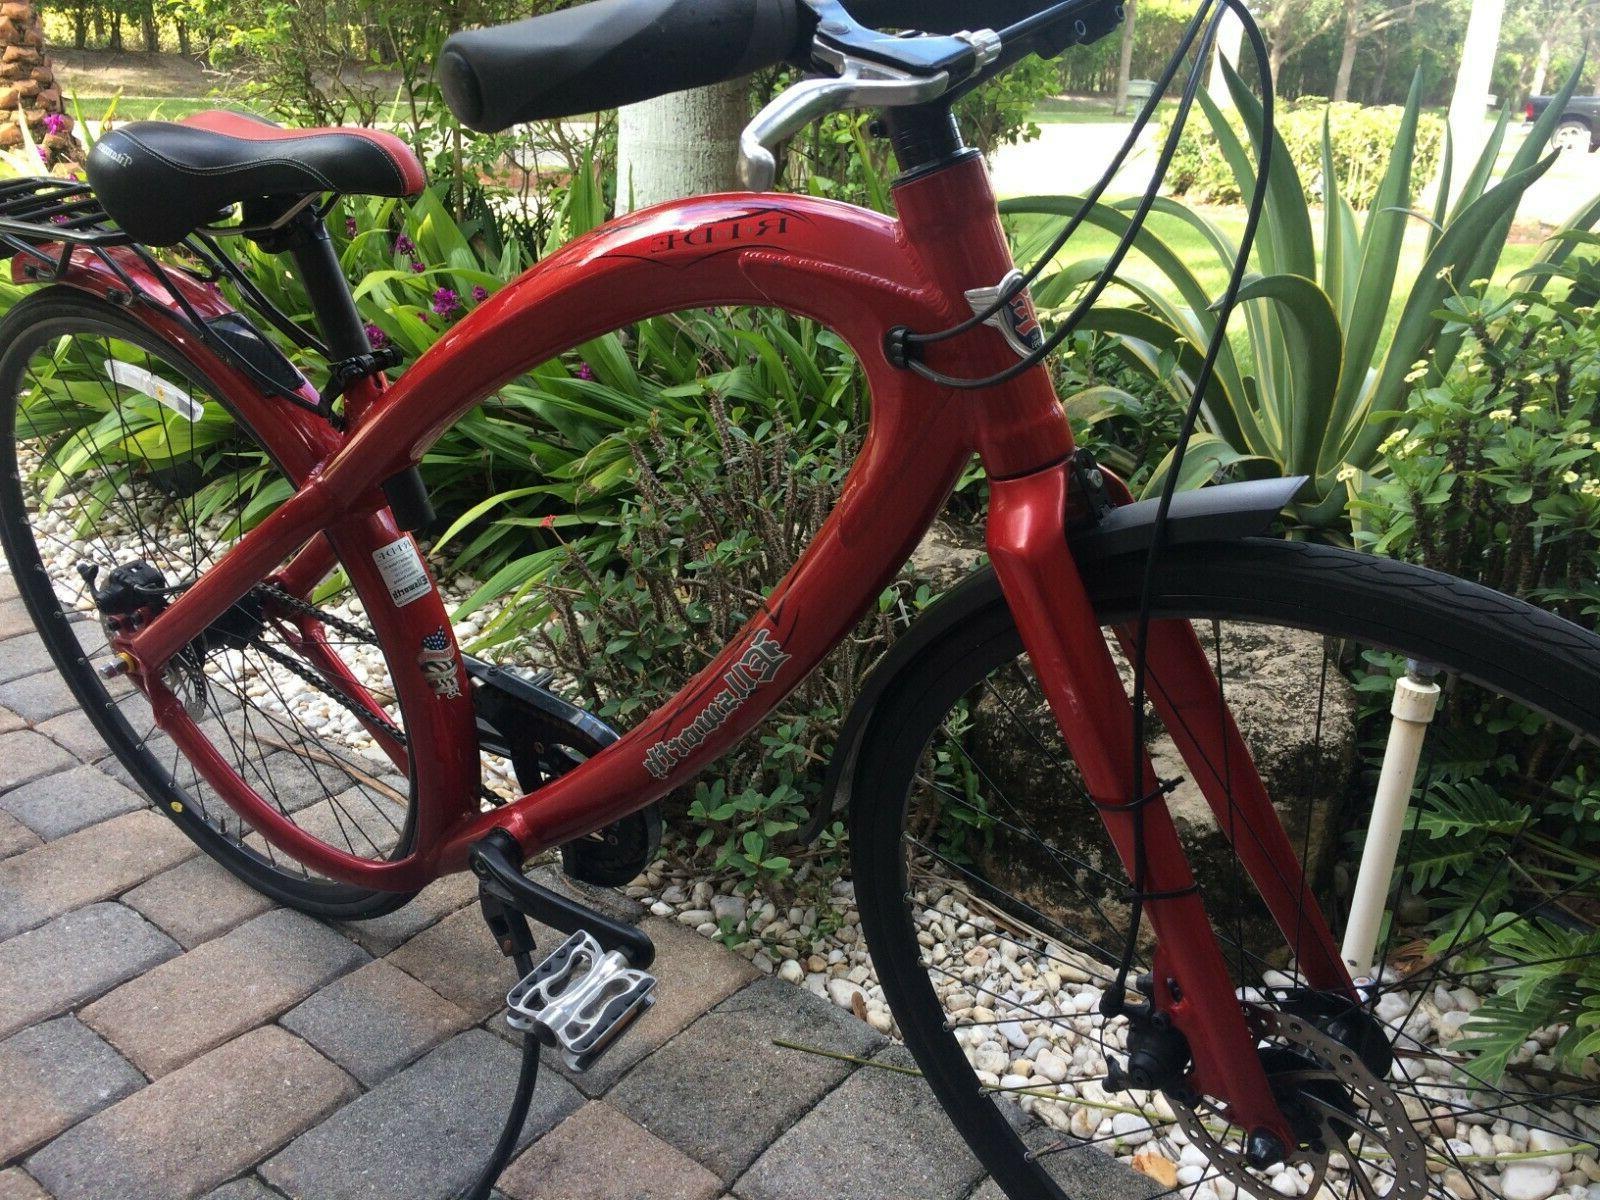 Ellsworth's Ride in Red bike patented